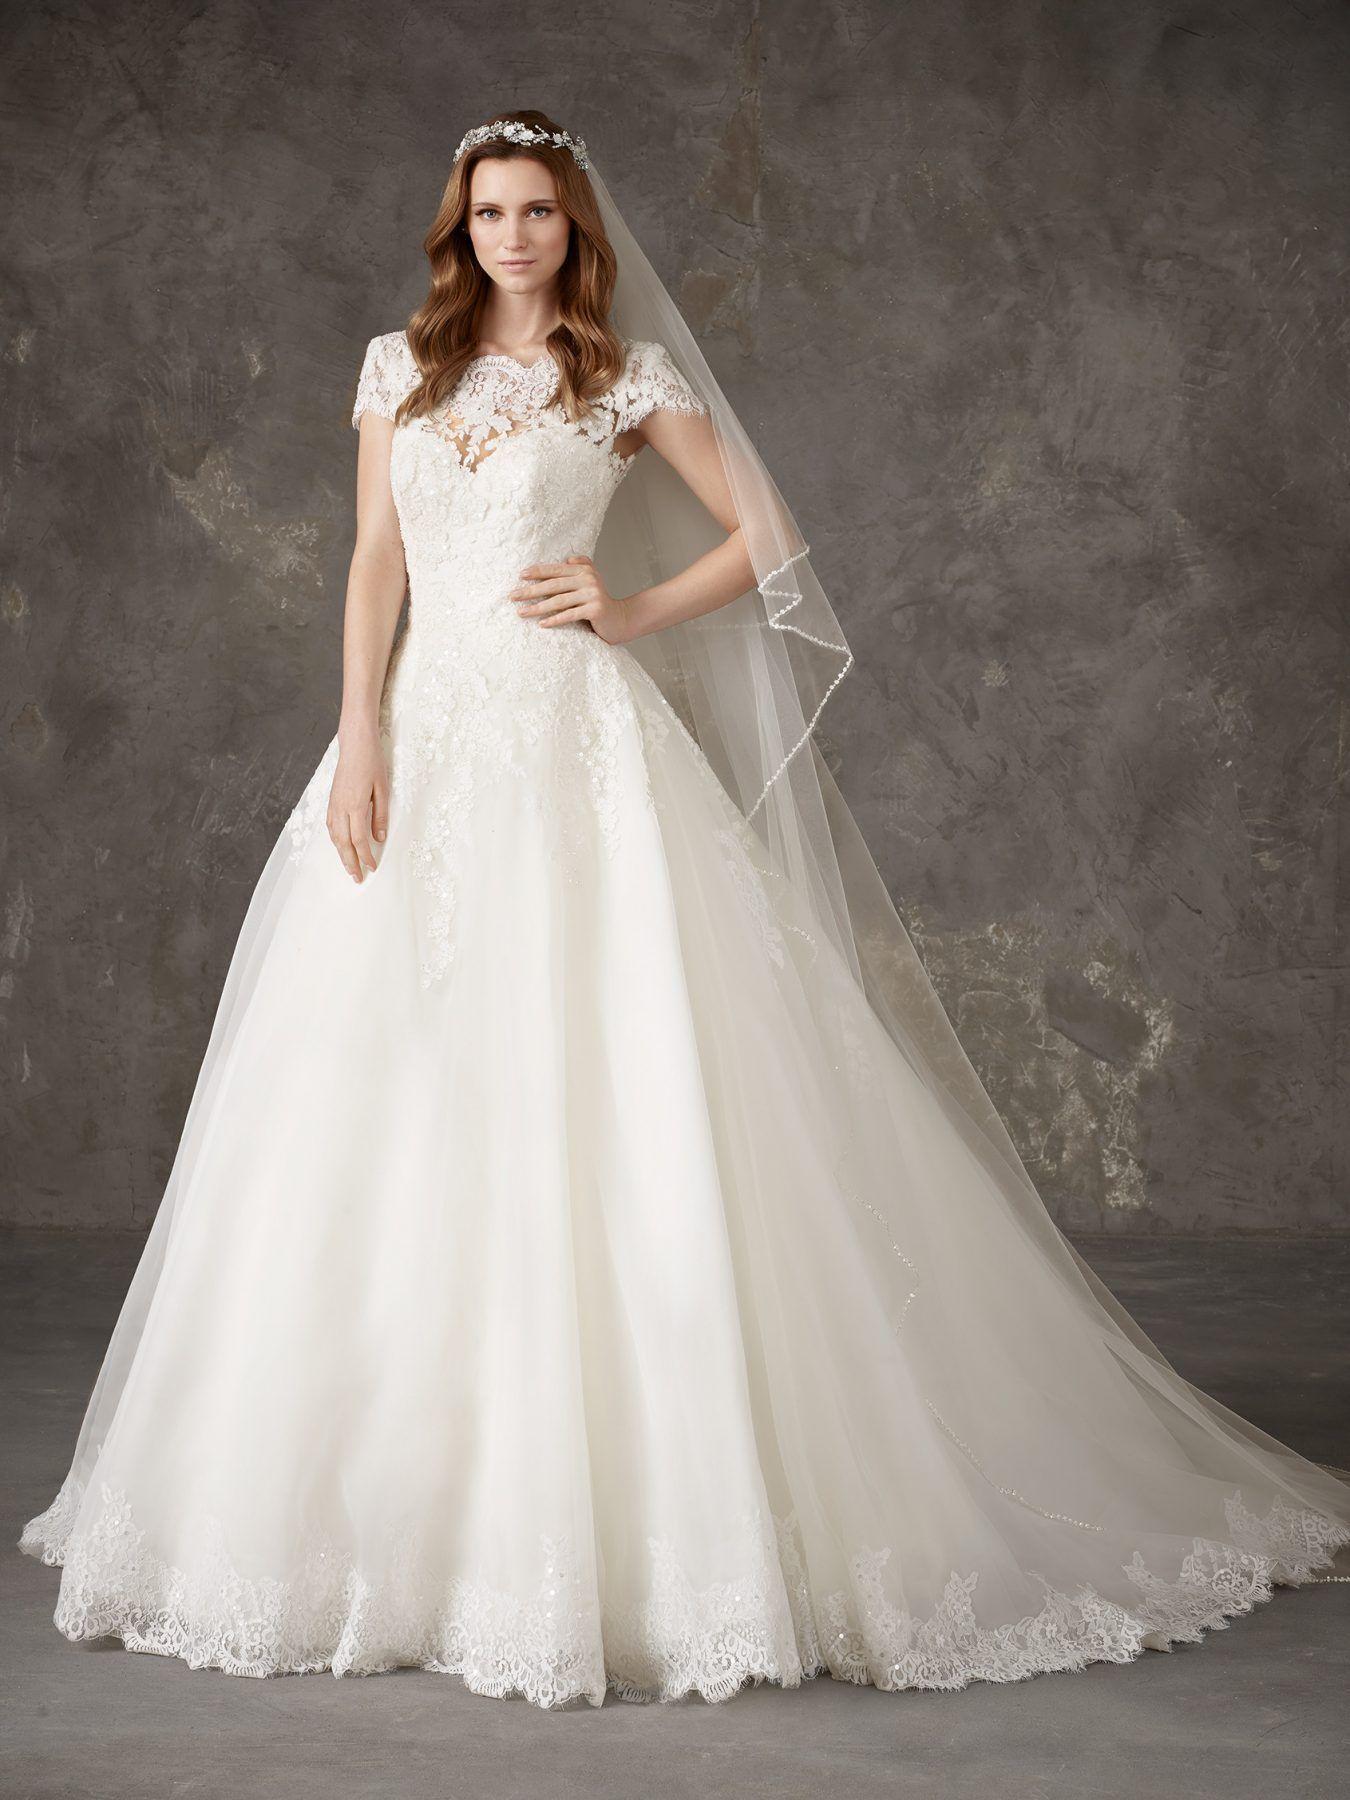 2de1f5d229fb Wedding Dress Lace Bodice Tulle Skirt